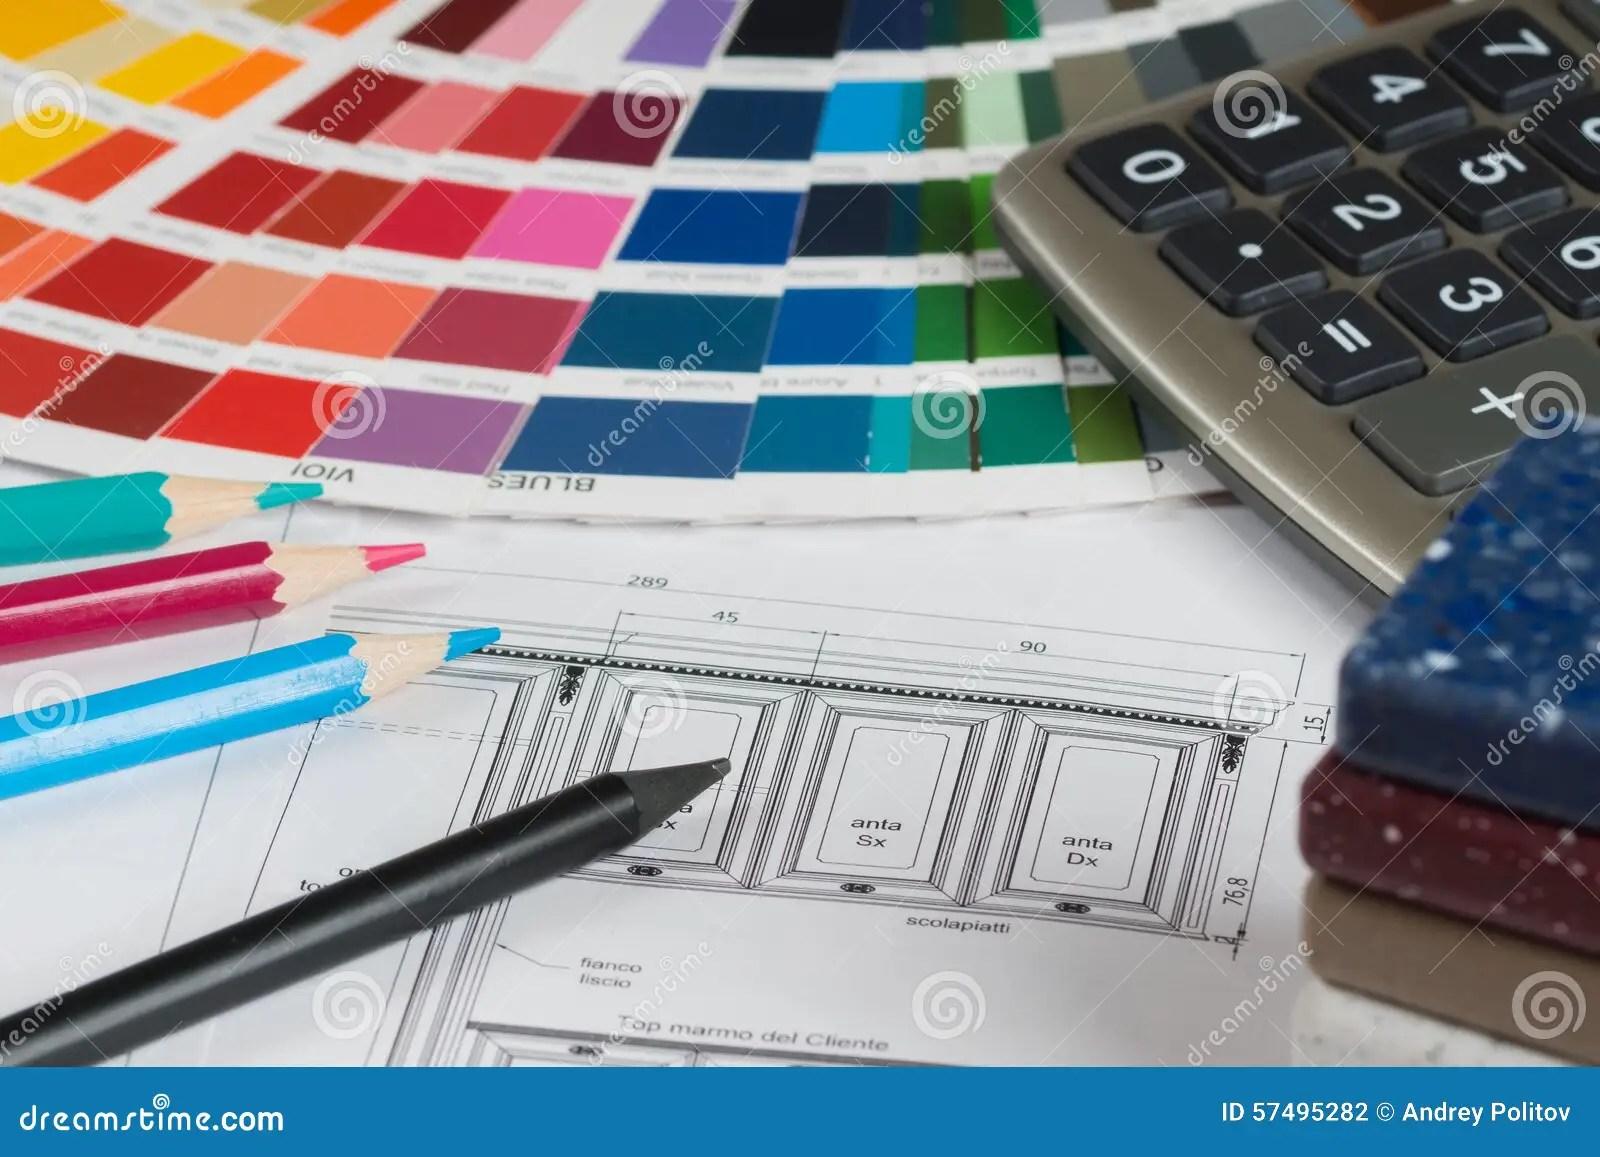 kitchen calculator wall panels 与调色板 桌面样品 铅笔和calc的厨房项目库存照片 图片包括有项目 与五颜六色的调色板 铅笔和计算器的厨房项目